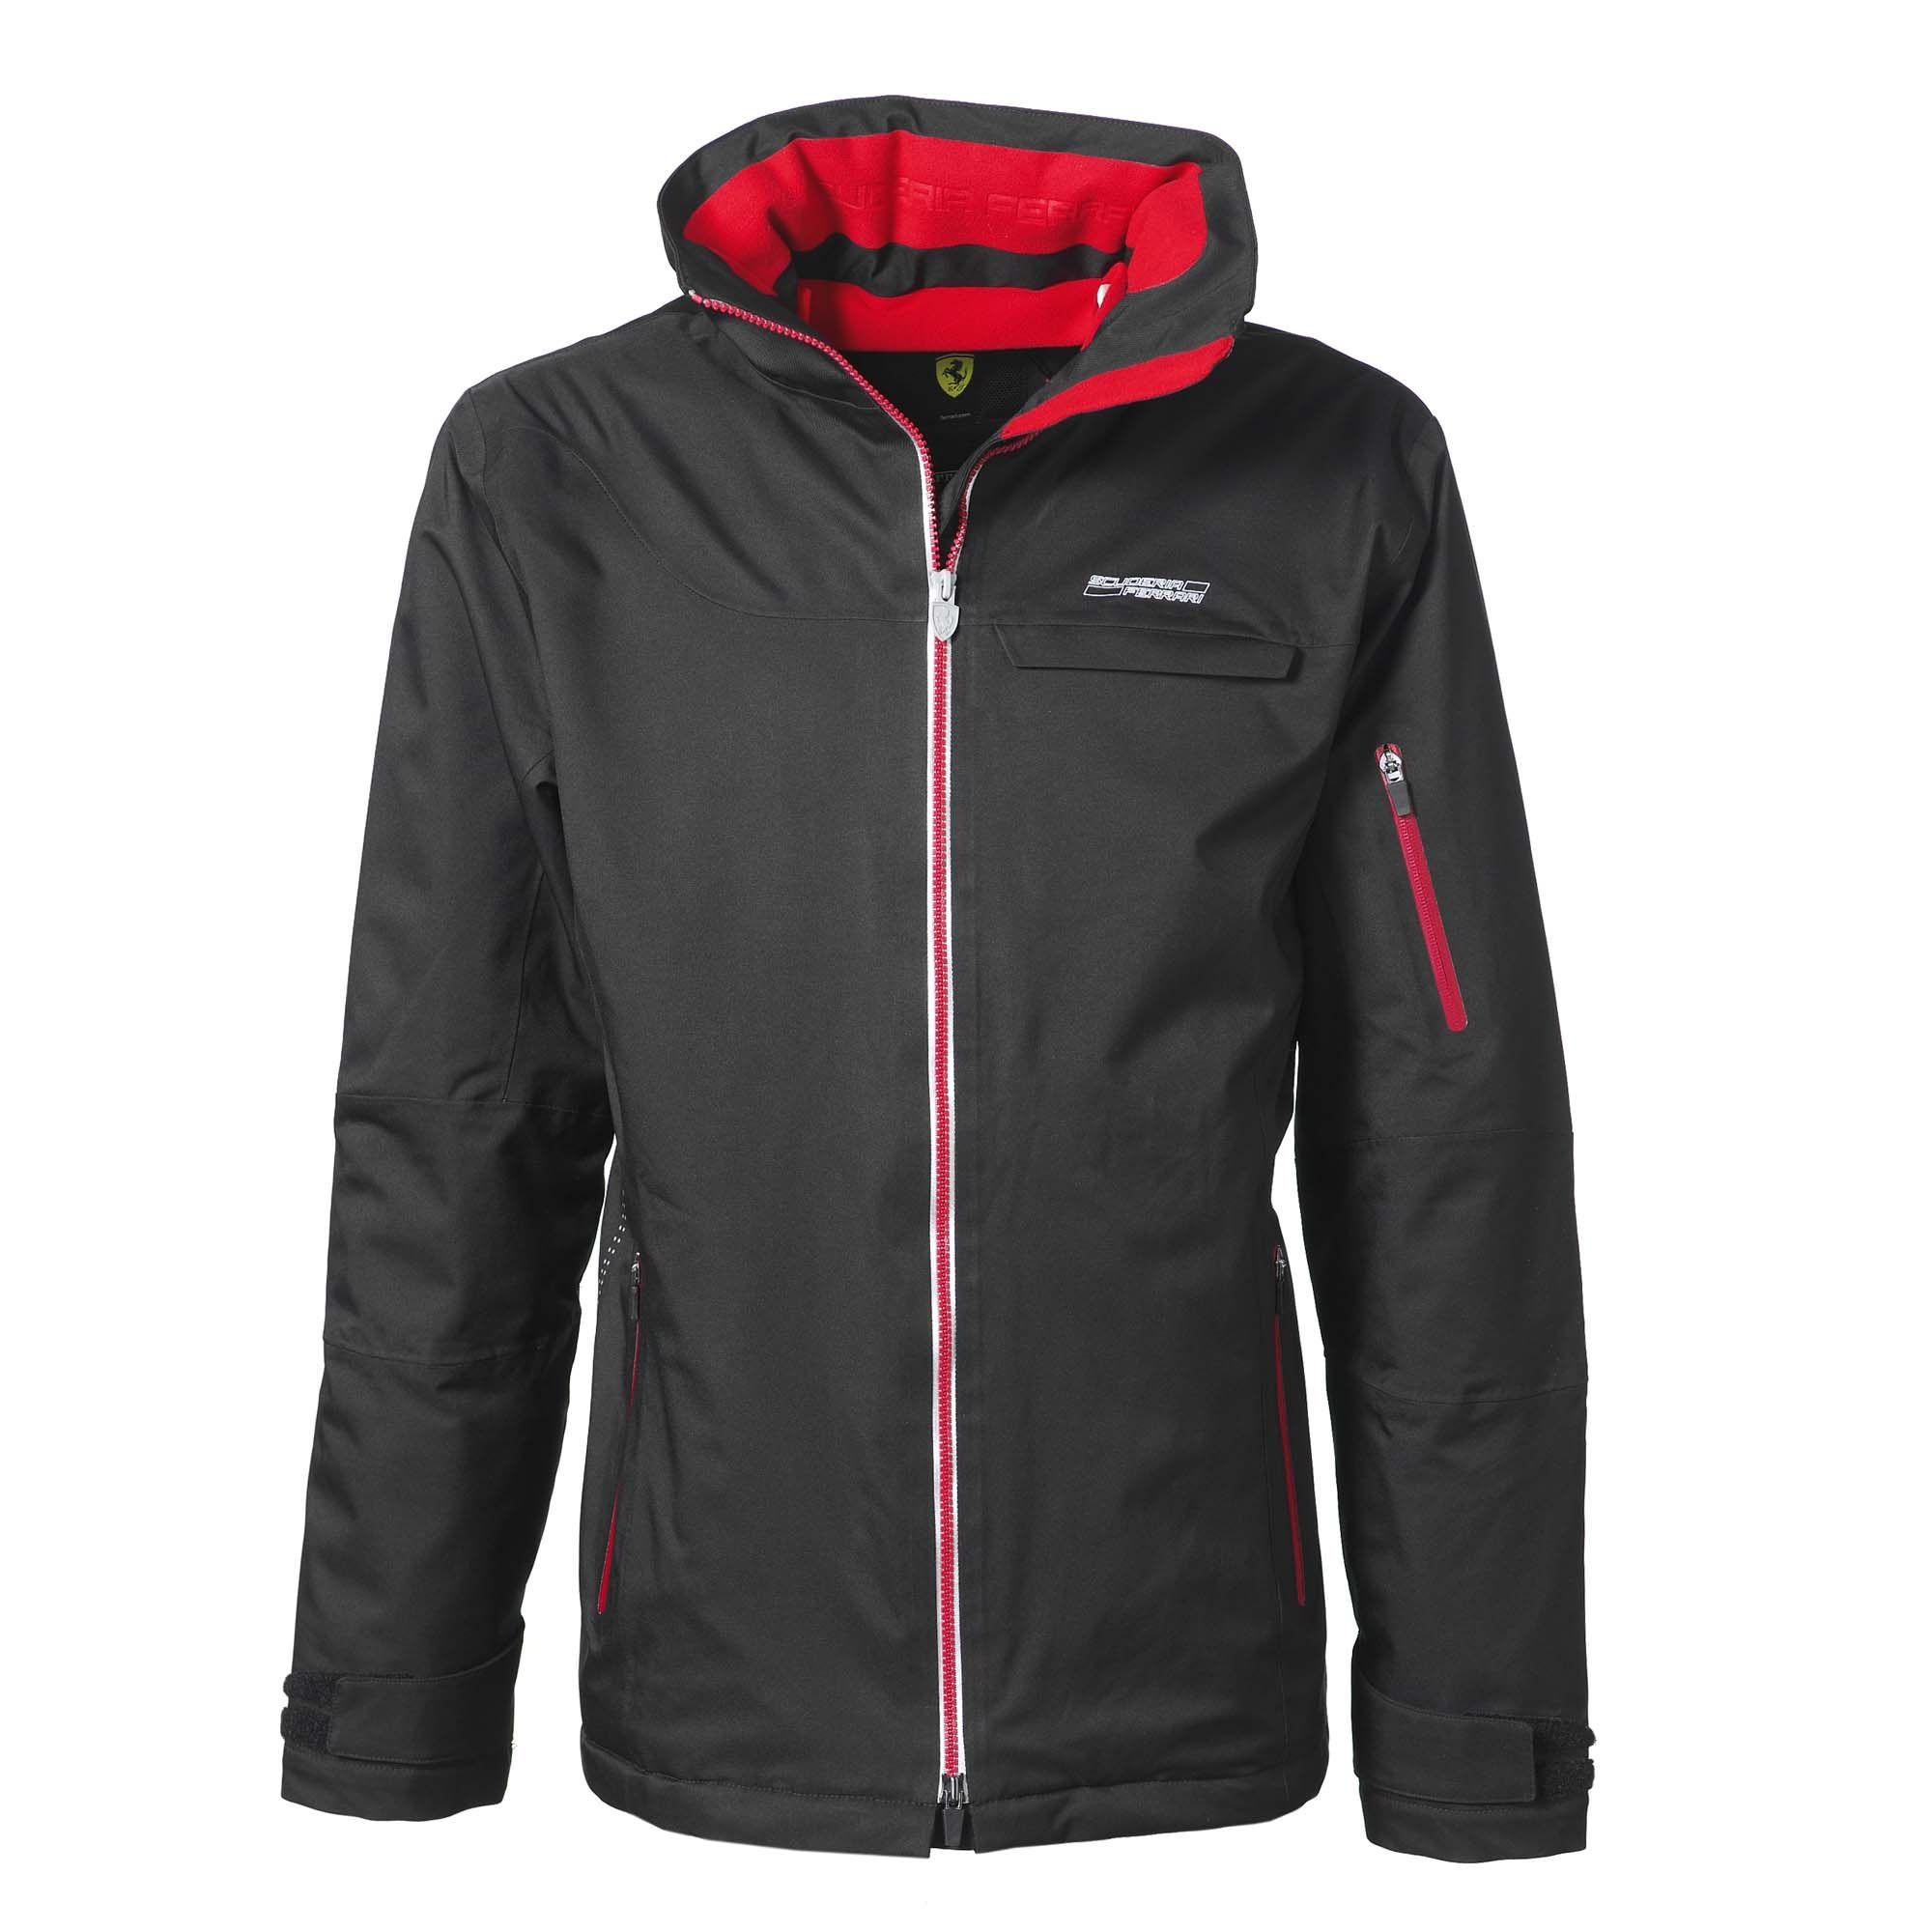 softshell men lyst gallery track normal jacket for puma black scuderia product clothing in ferrari